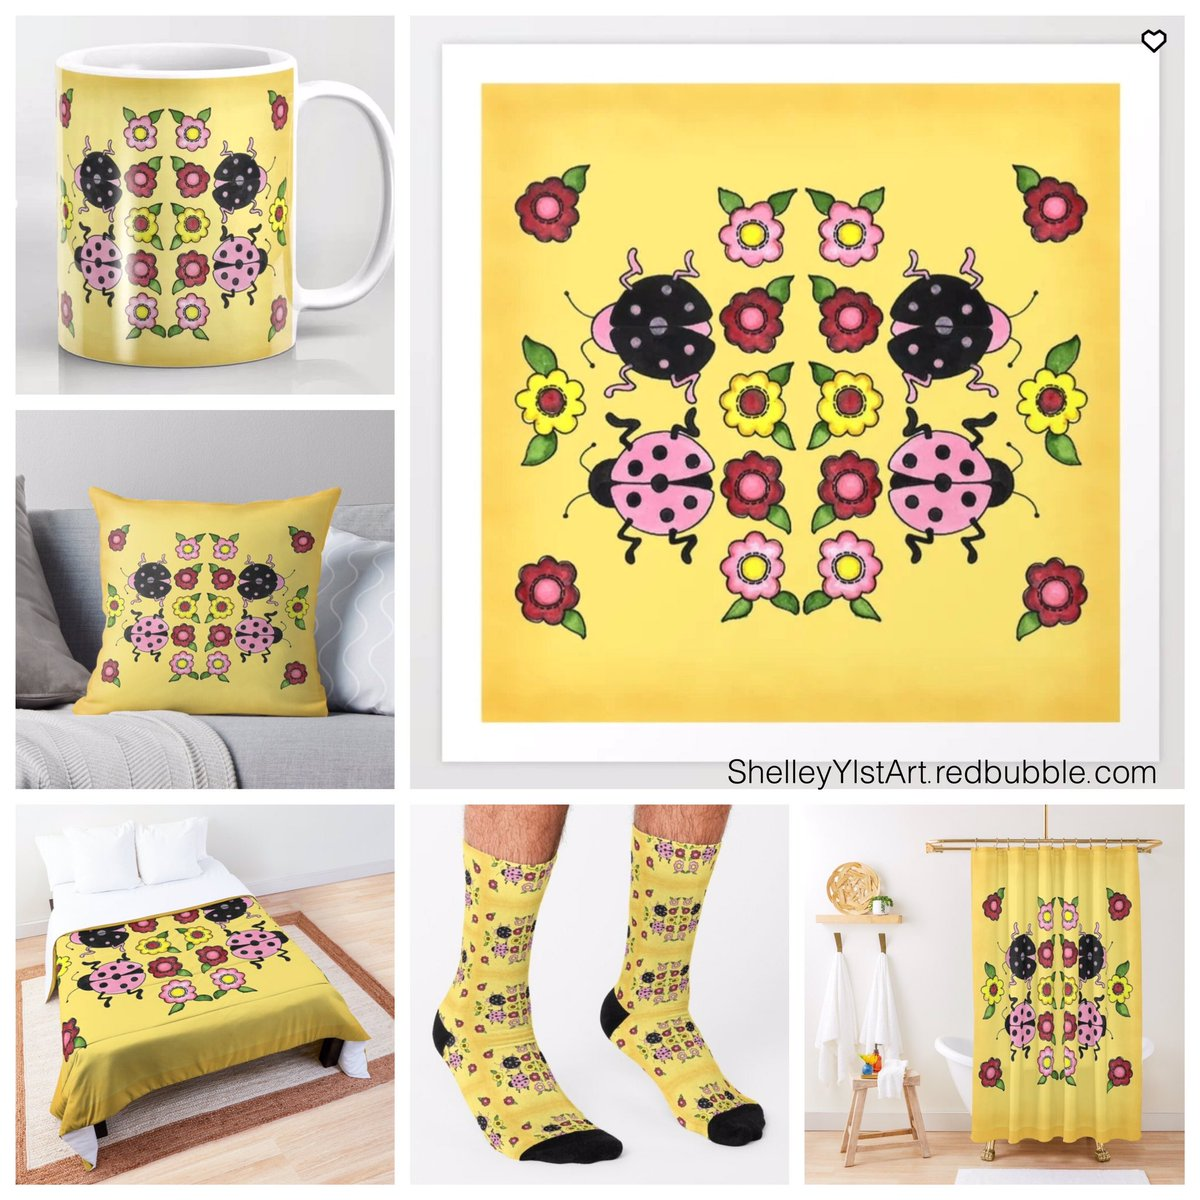 "More ladybugs! ""Ladybugs with Flowers"" 👉  Link to my Redbubble Shop 👉  #shelleyylstart #redbubble #ladybug #ladybugs #ladybugsofinstagram #art #artprints #flowers #decor #homedecor #coffeecup #pillow #comforter #socks #showercurtain"